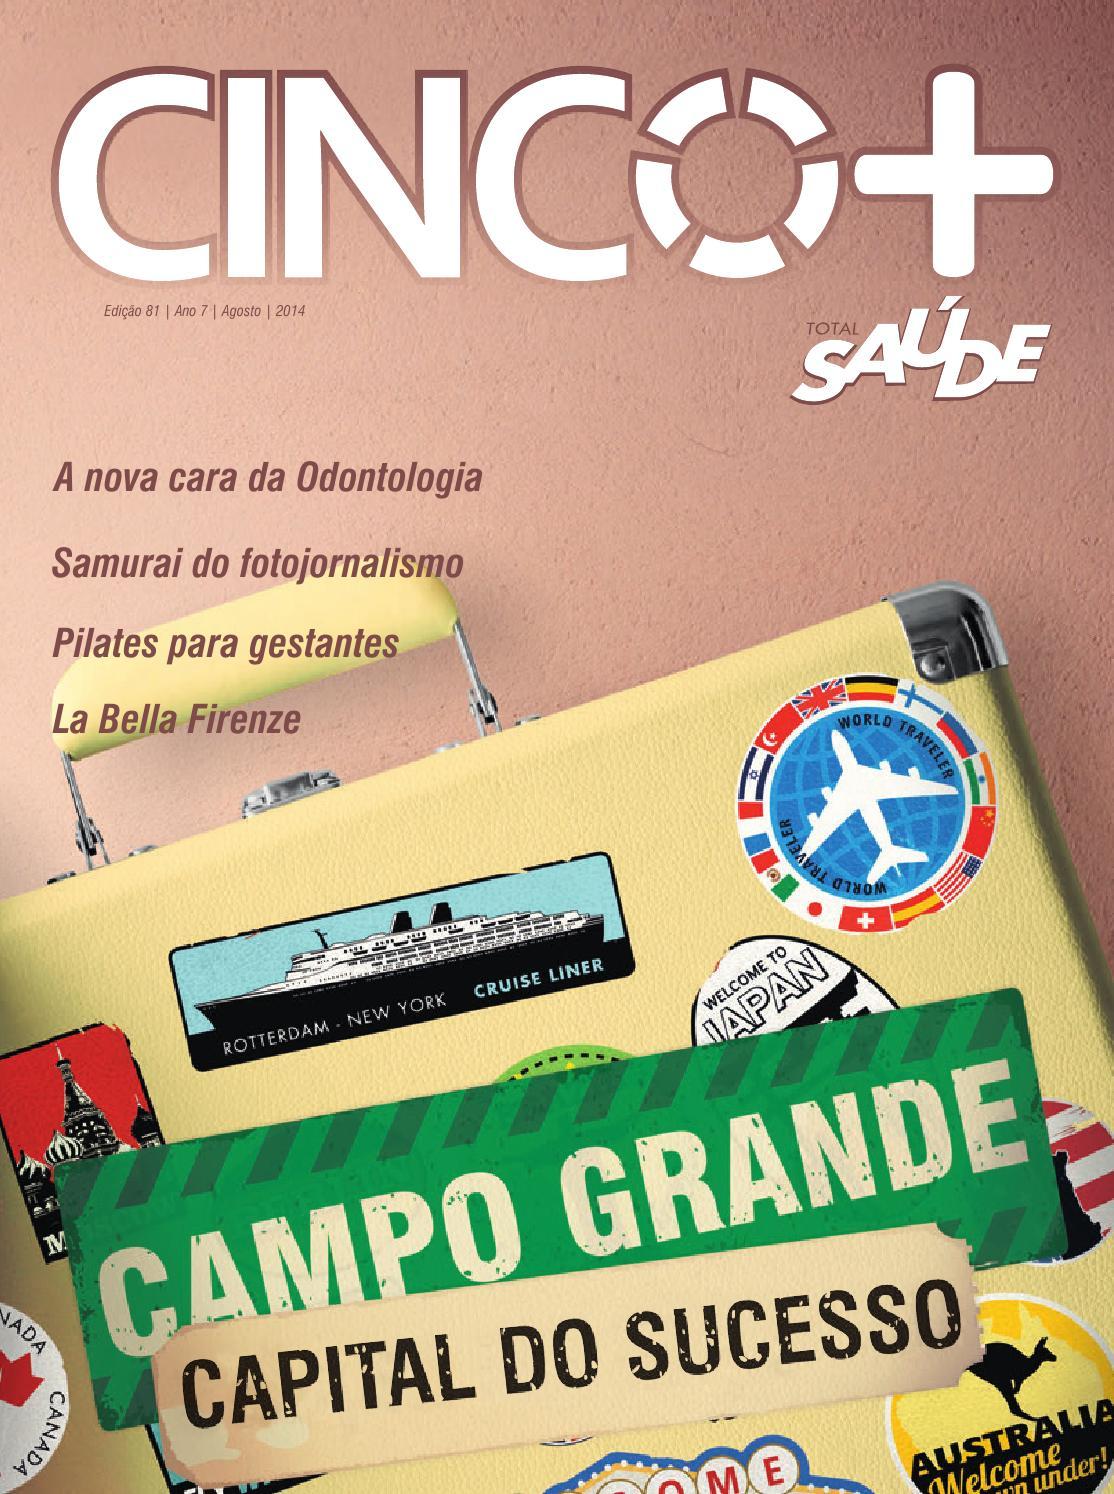 Campo Grande  Capital do Sucesso  Agosto 2014  by Revista Cinco + - issuu a47a08b3bc